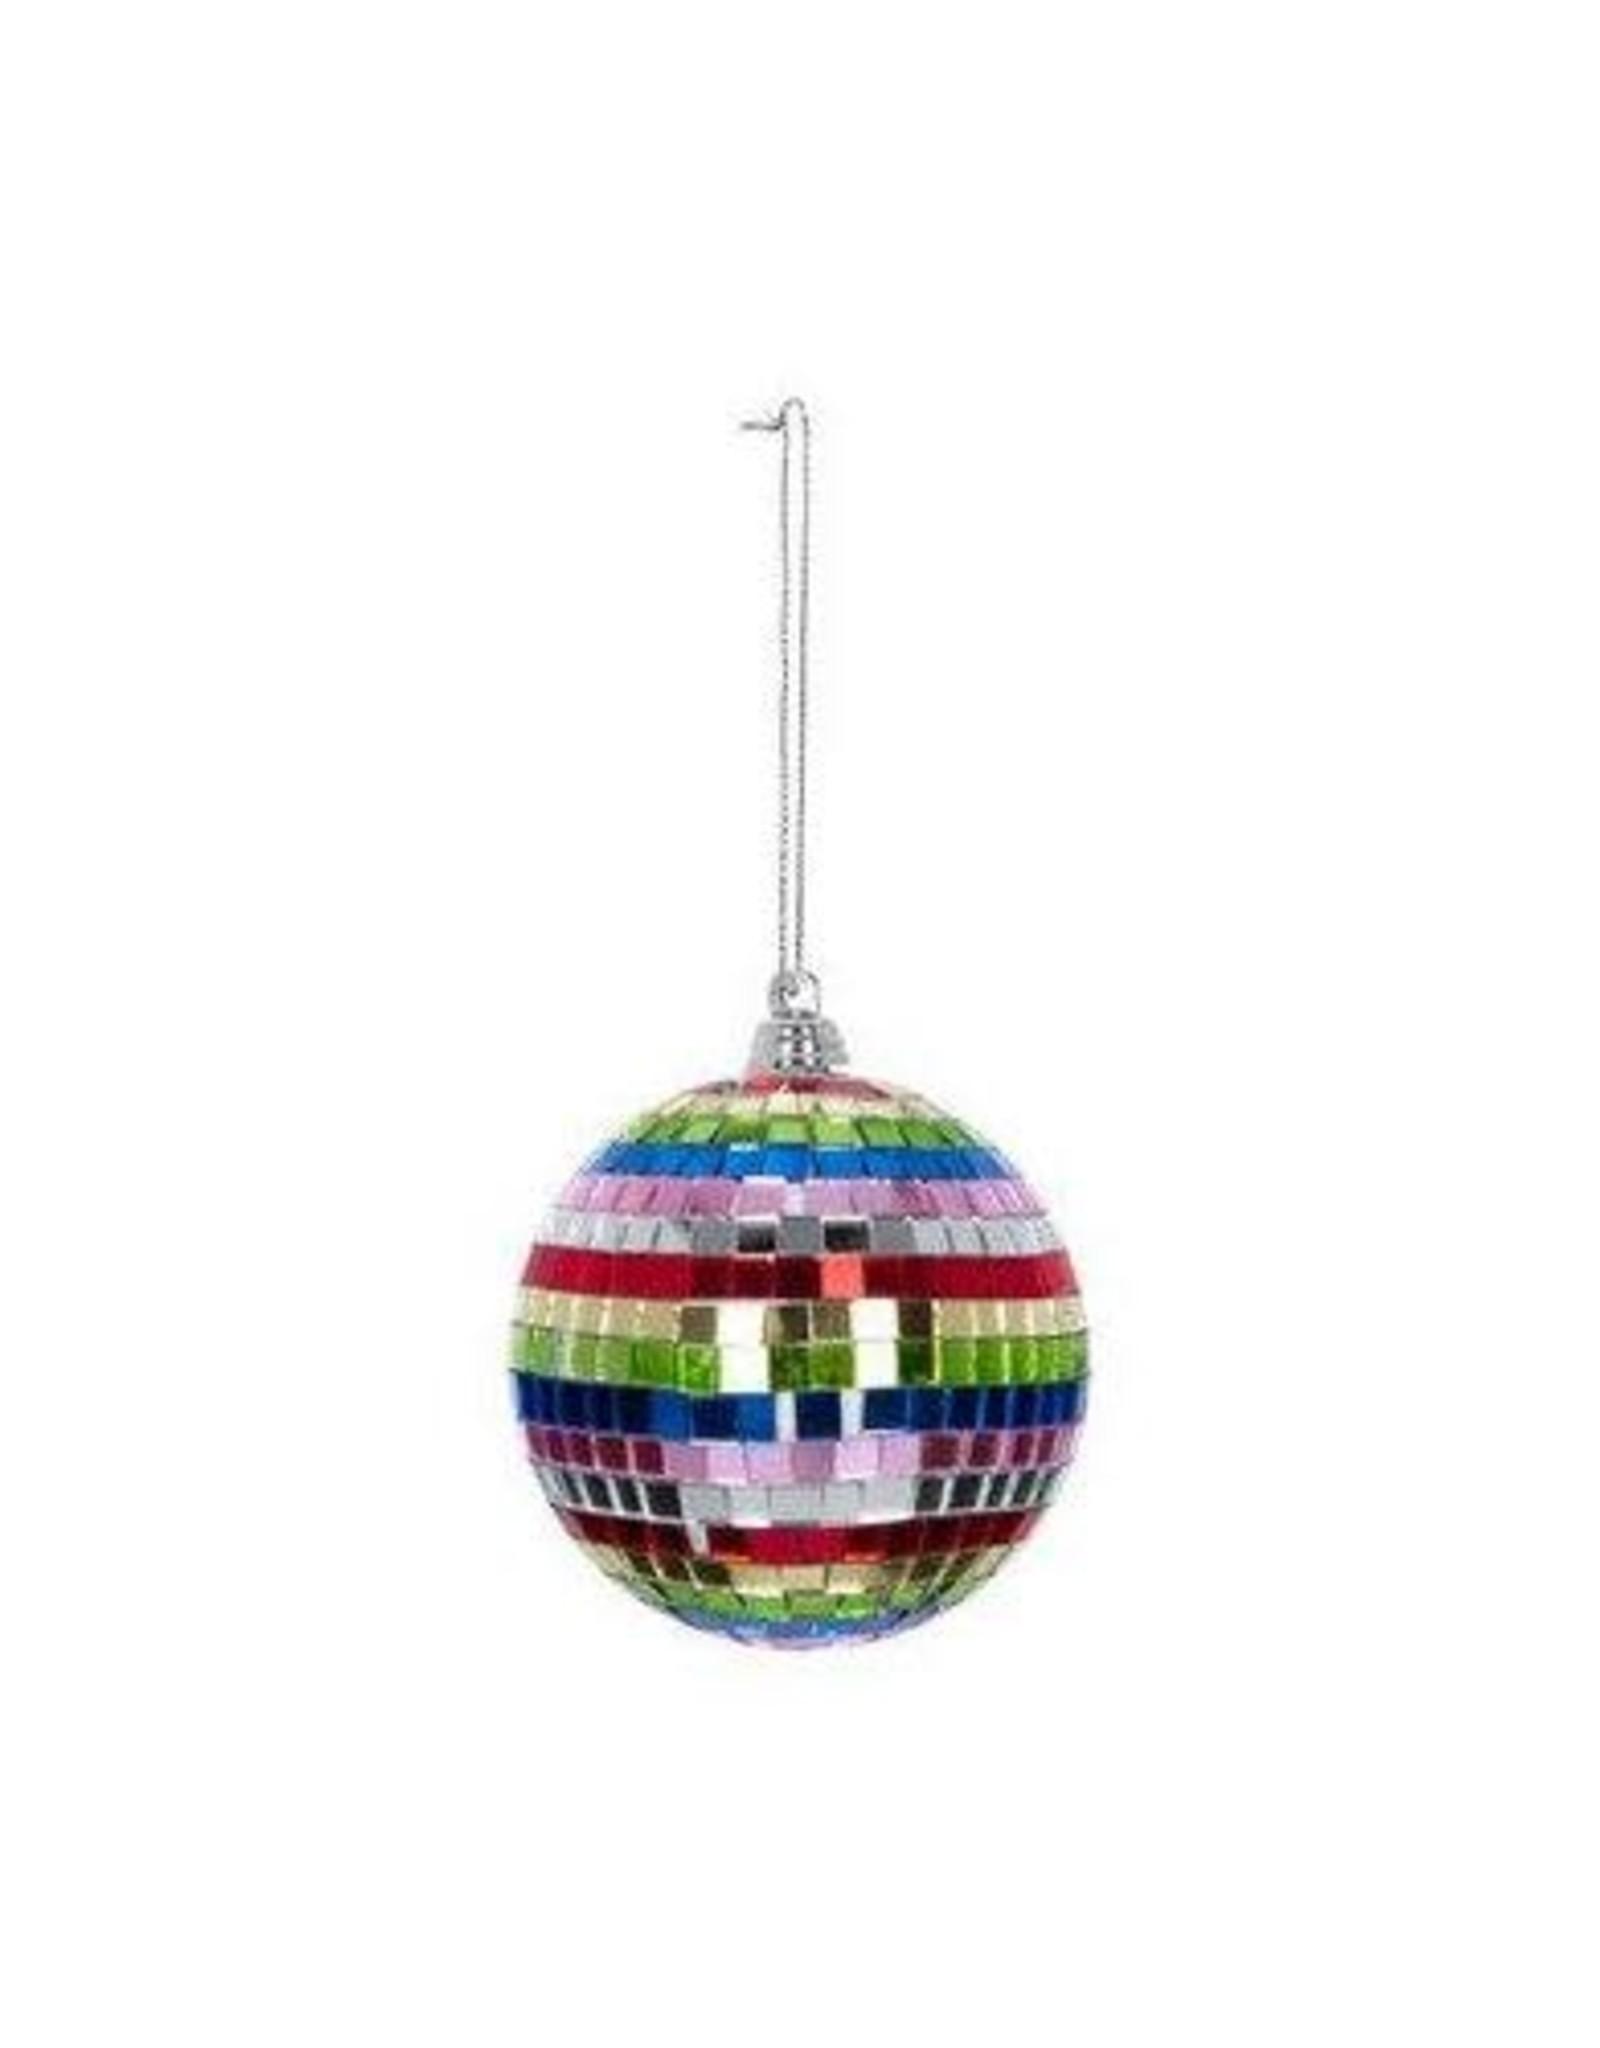 Spectrum Mirror Ball Ornament